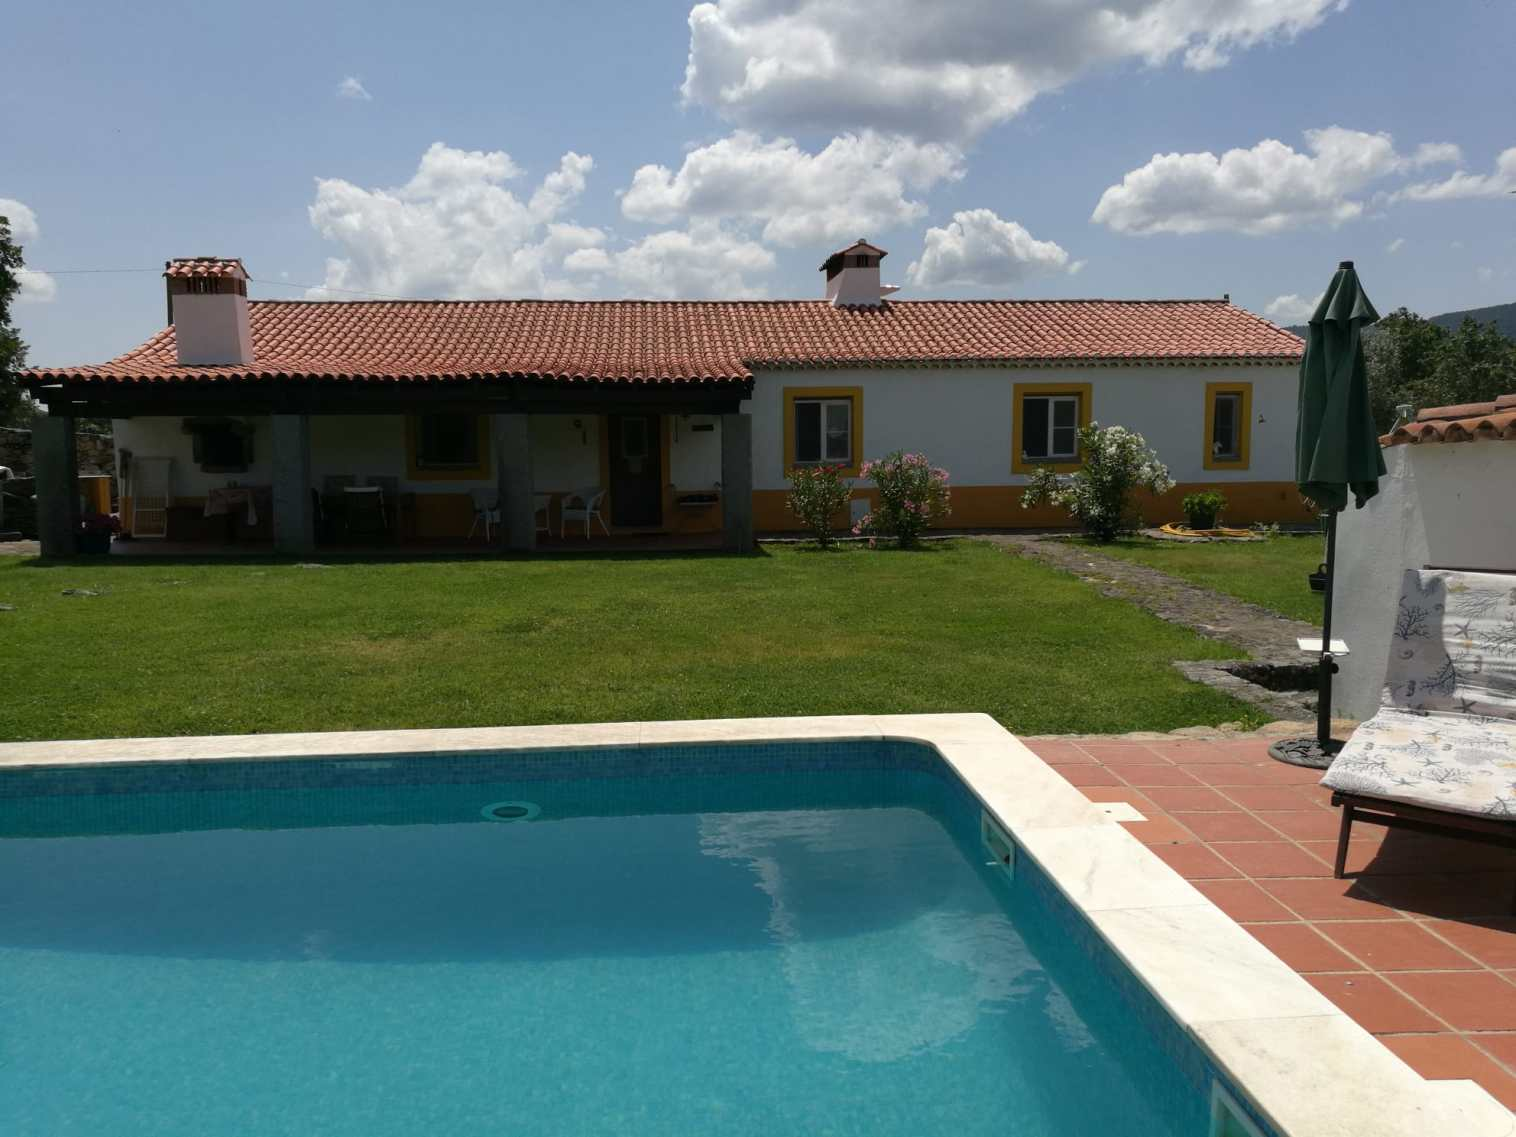 Casa das Amoras House & Swimming Pool